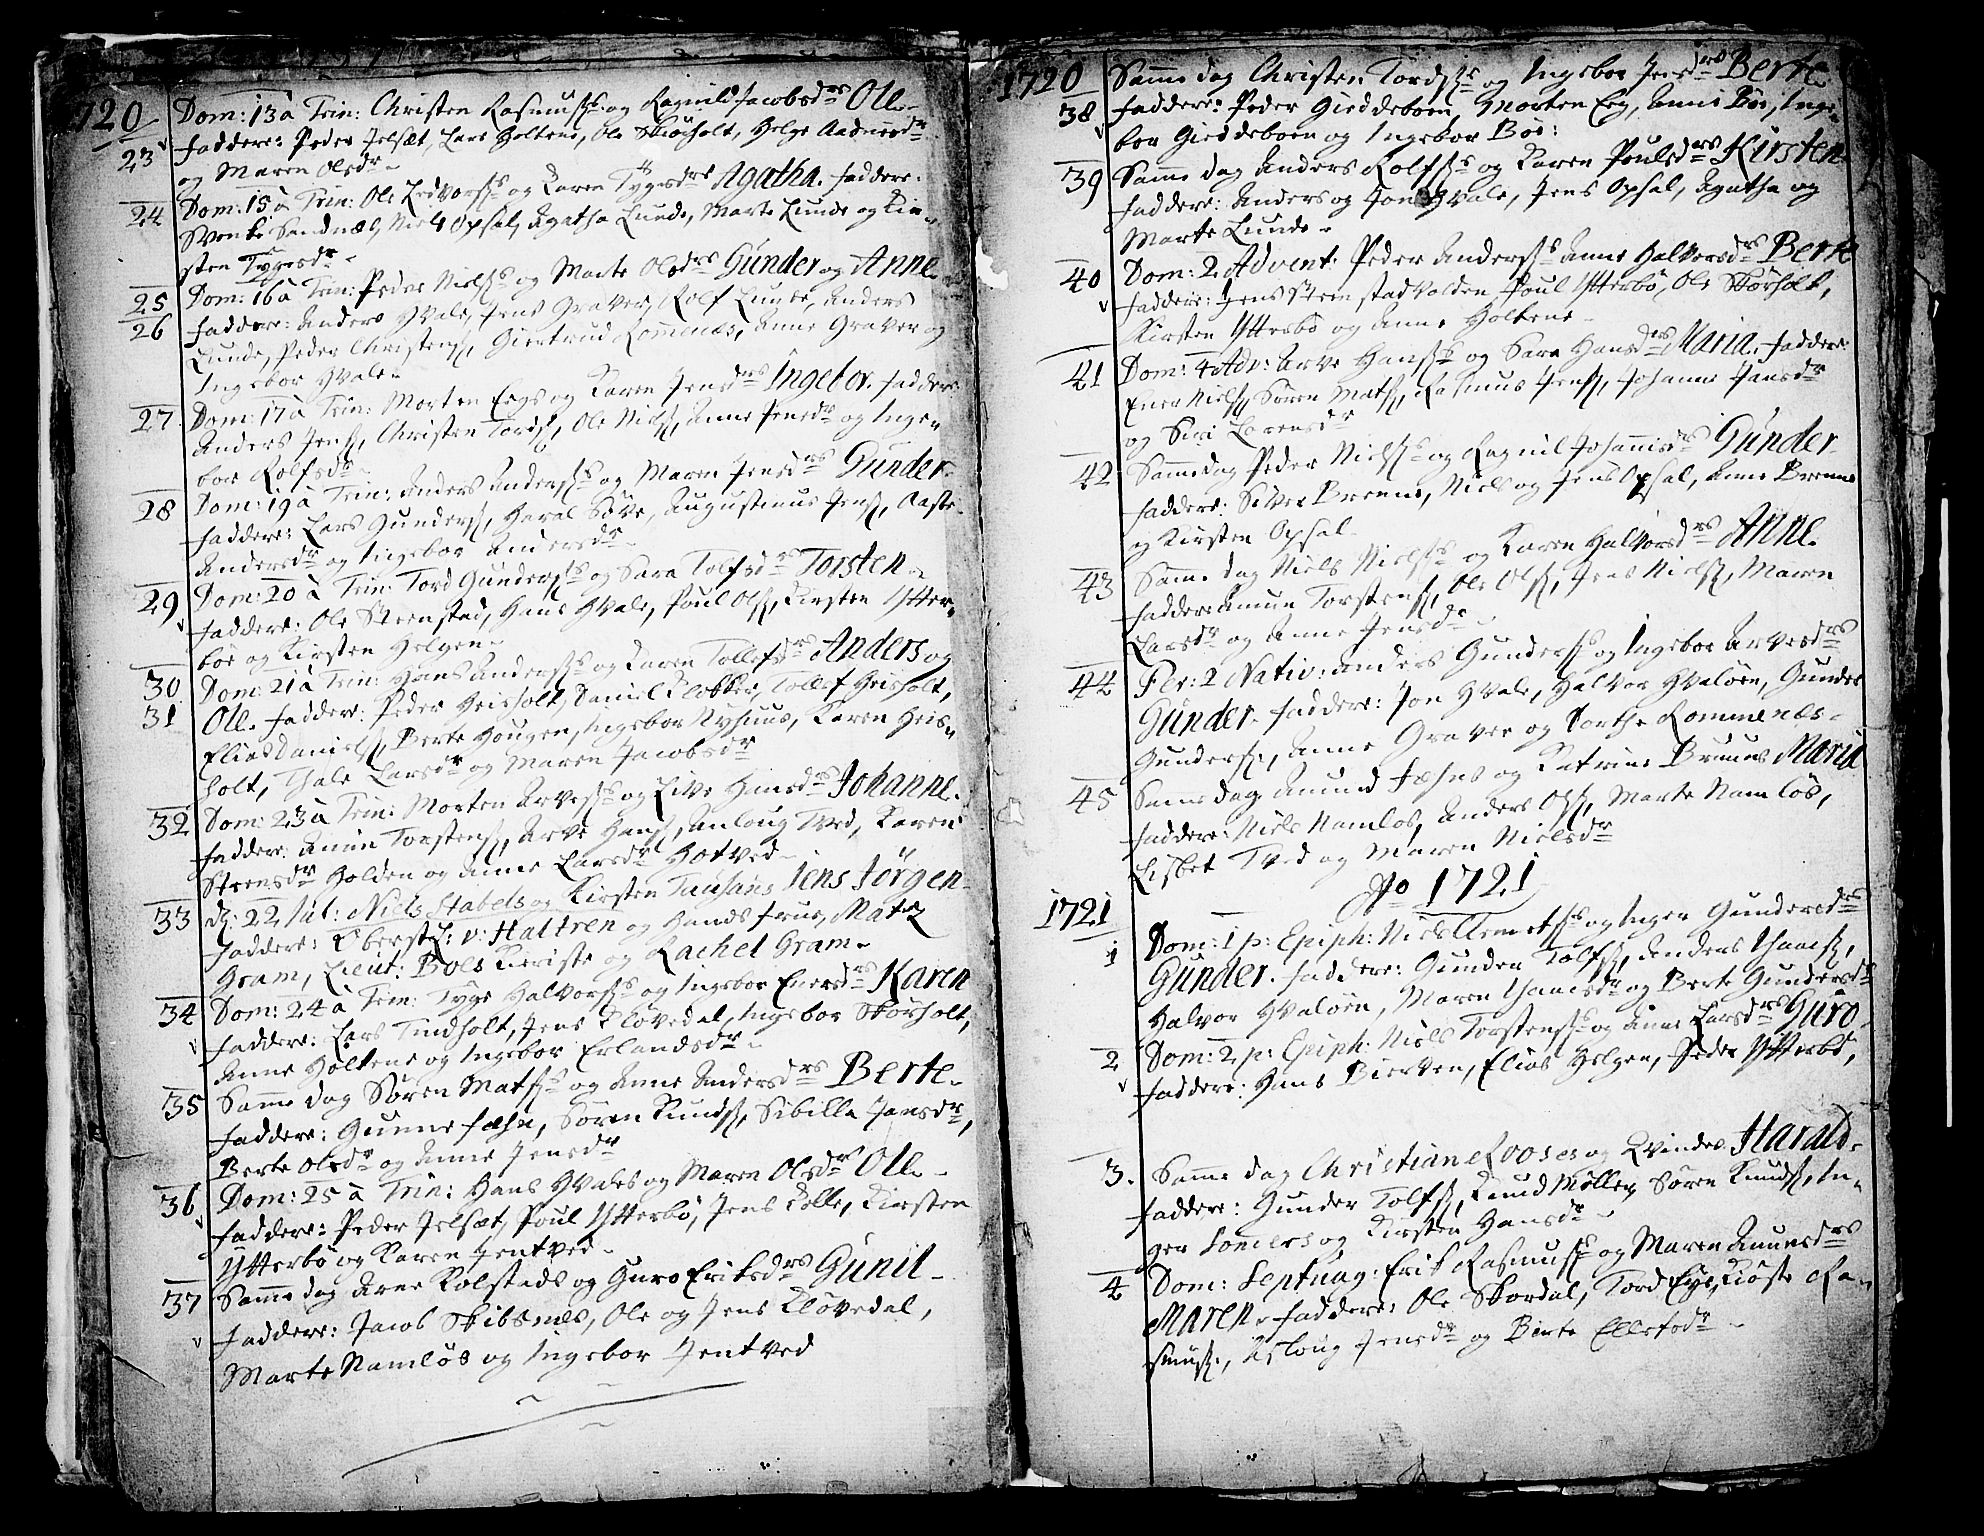 SAKO, Holla kirkebøker, F/Fa/L0001: Ministerialbok nr. 1, 1717-1779, s. 6